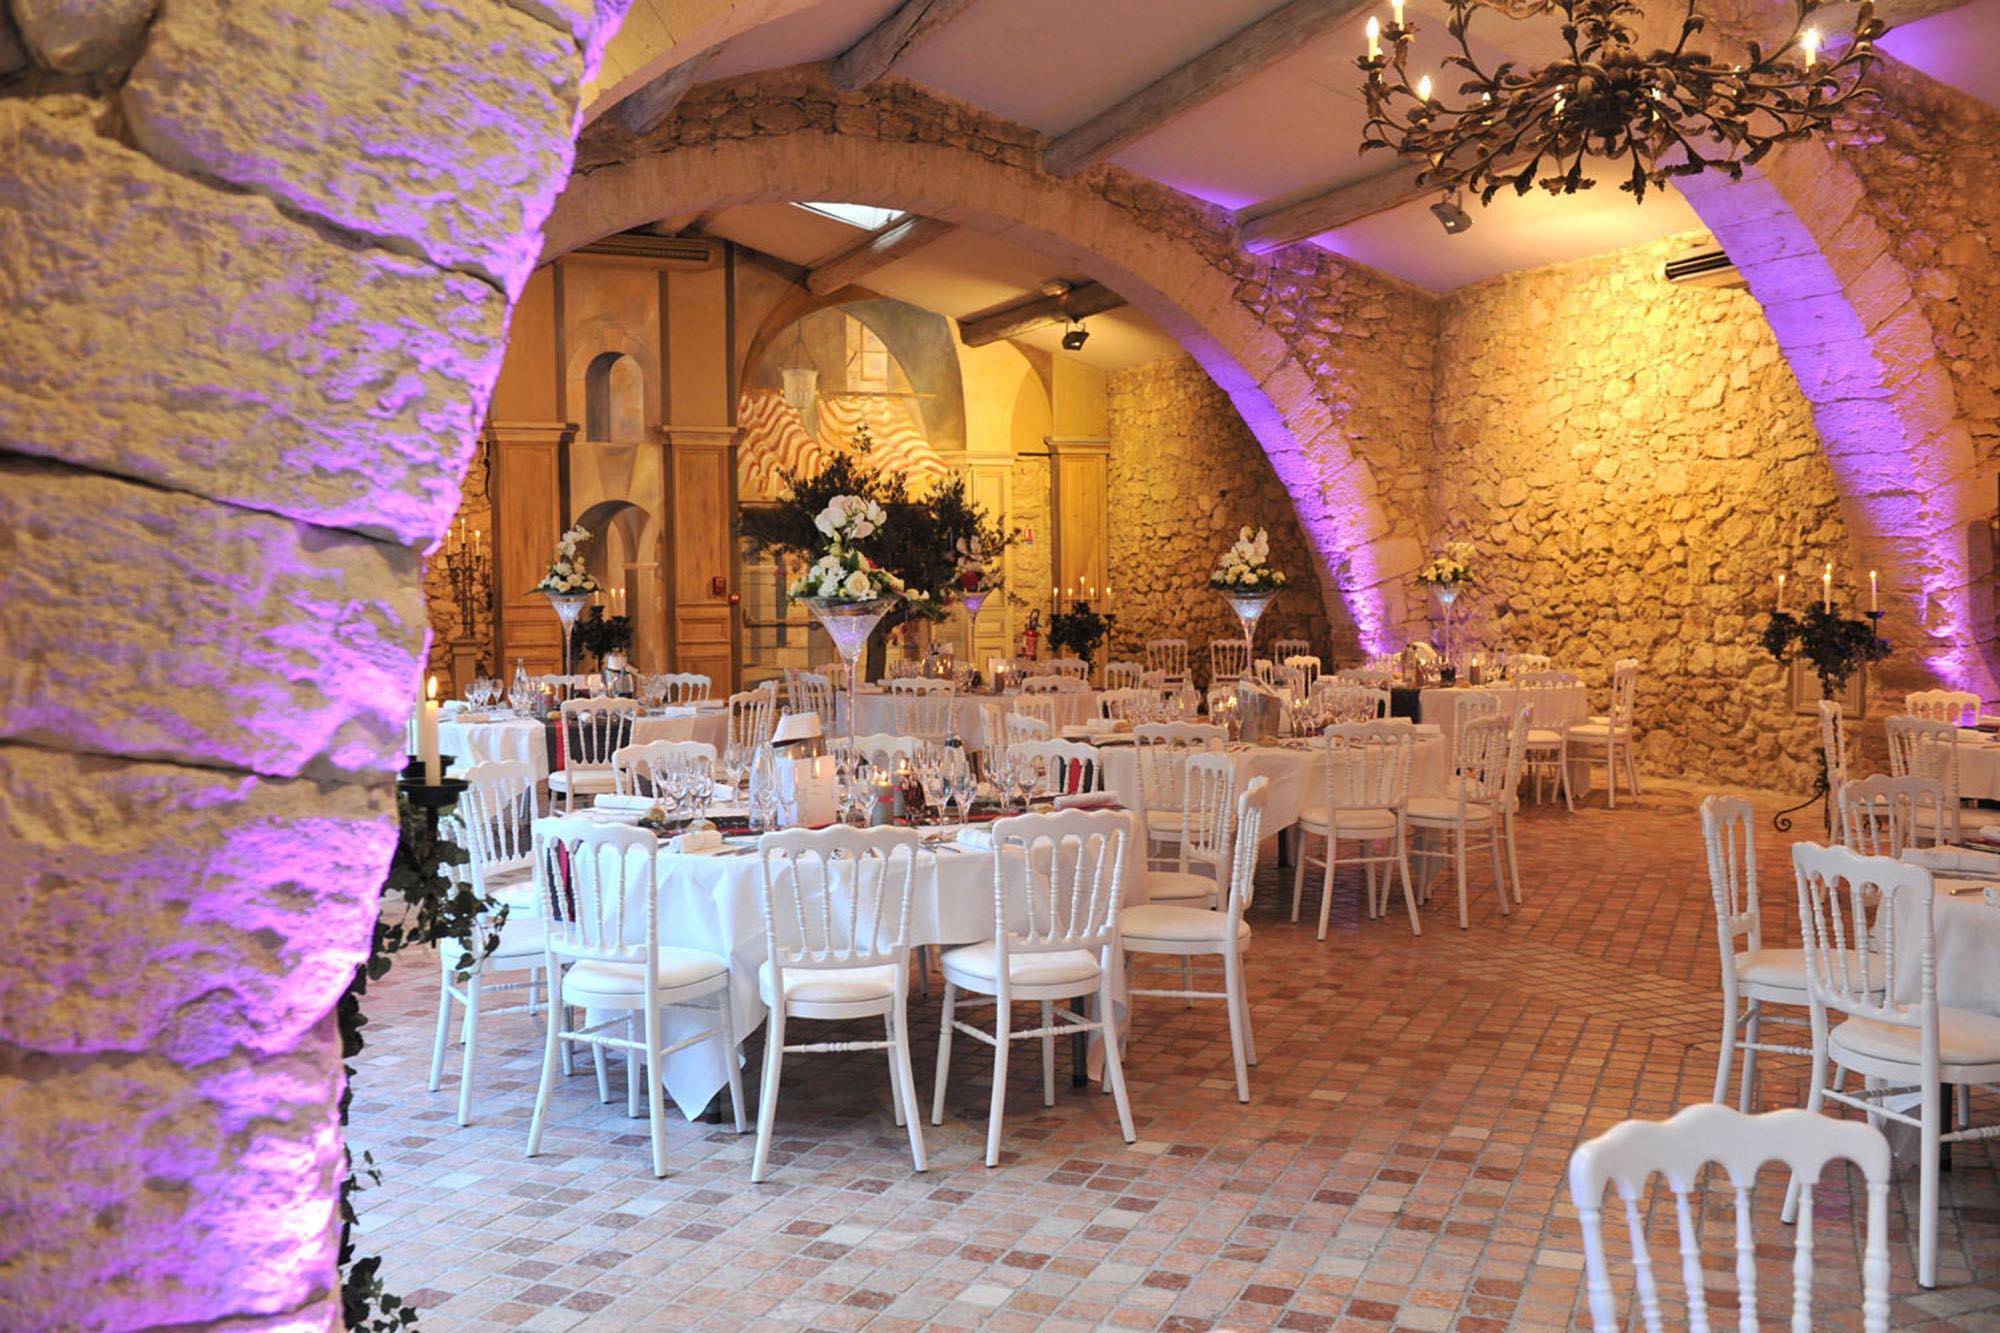 photographe-professionnel-mariage-chateau-pont-royal